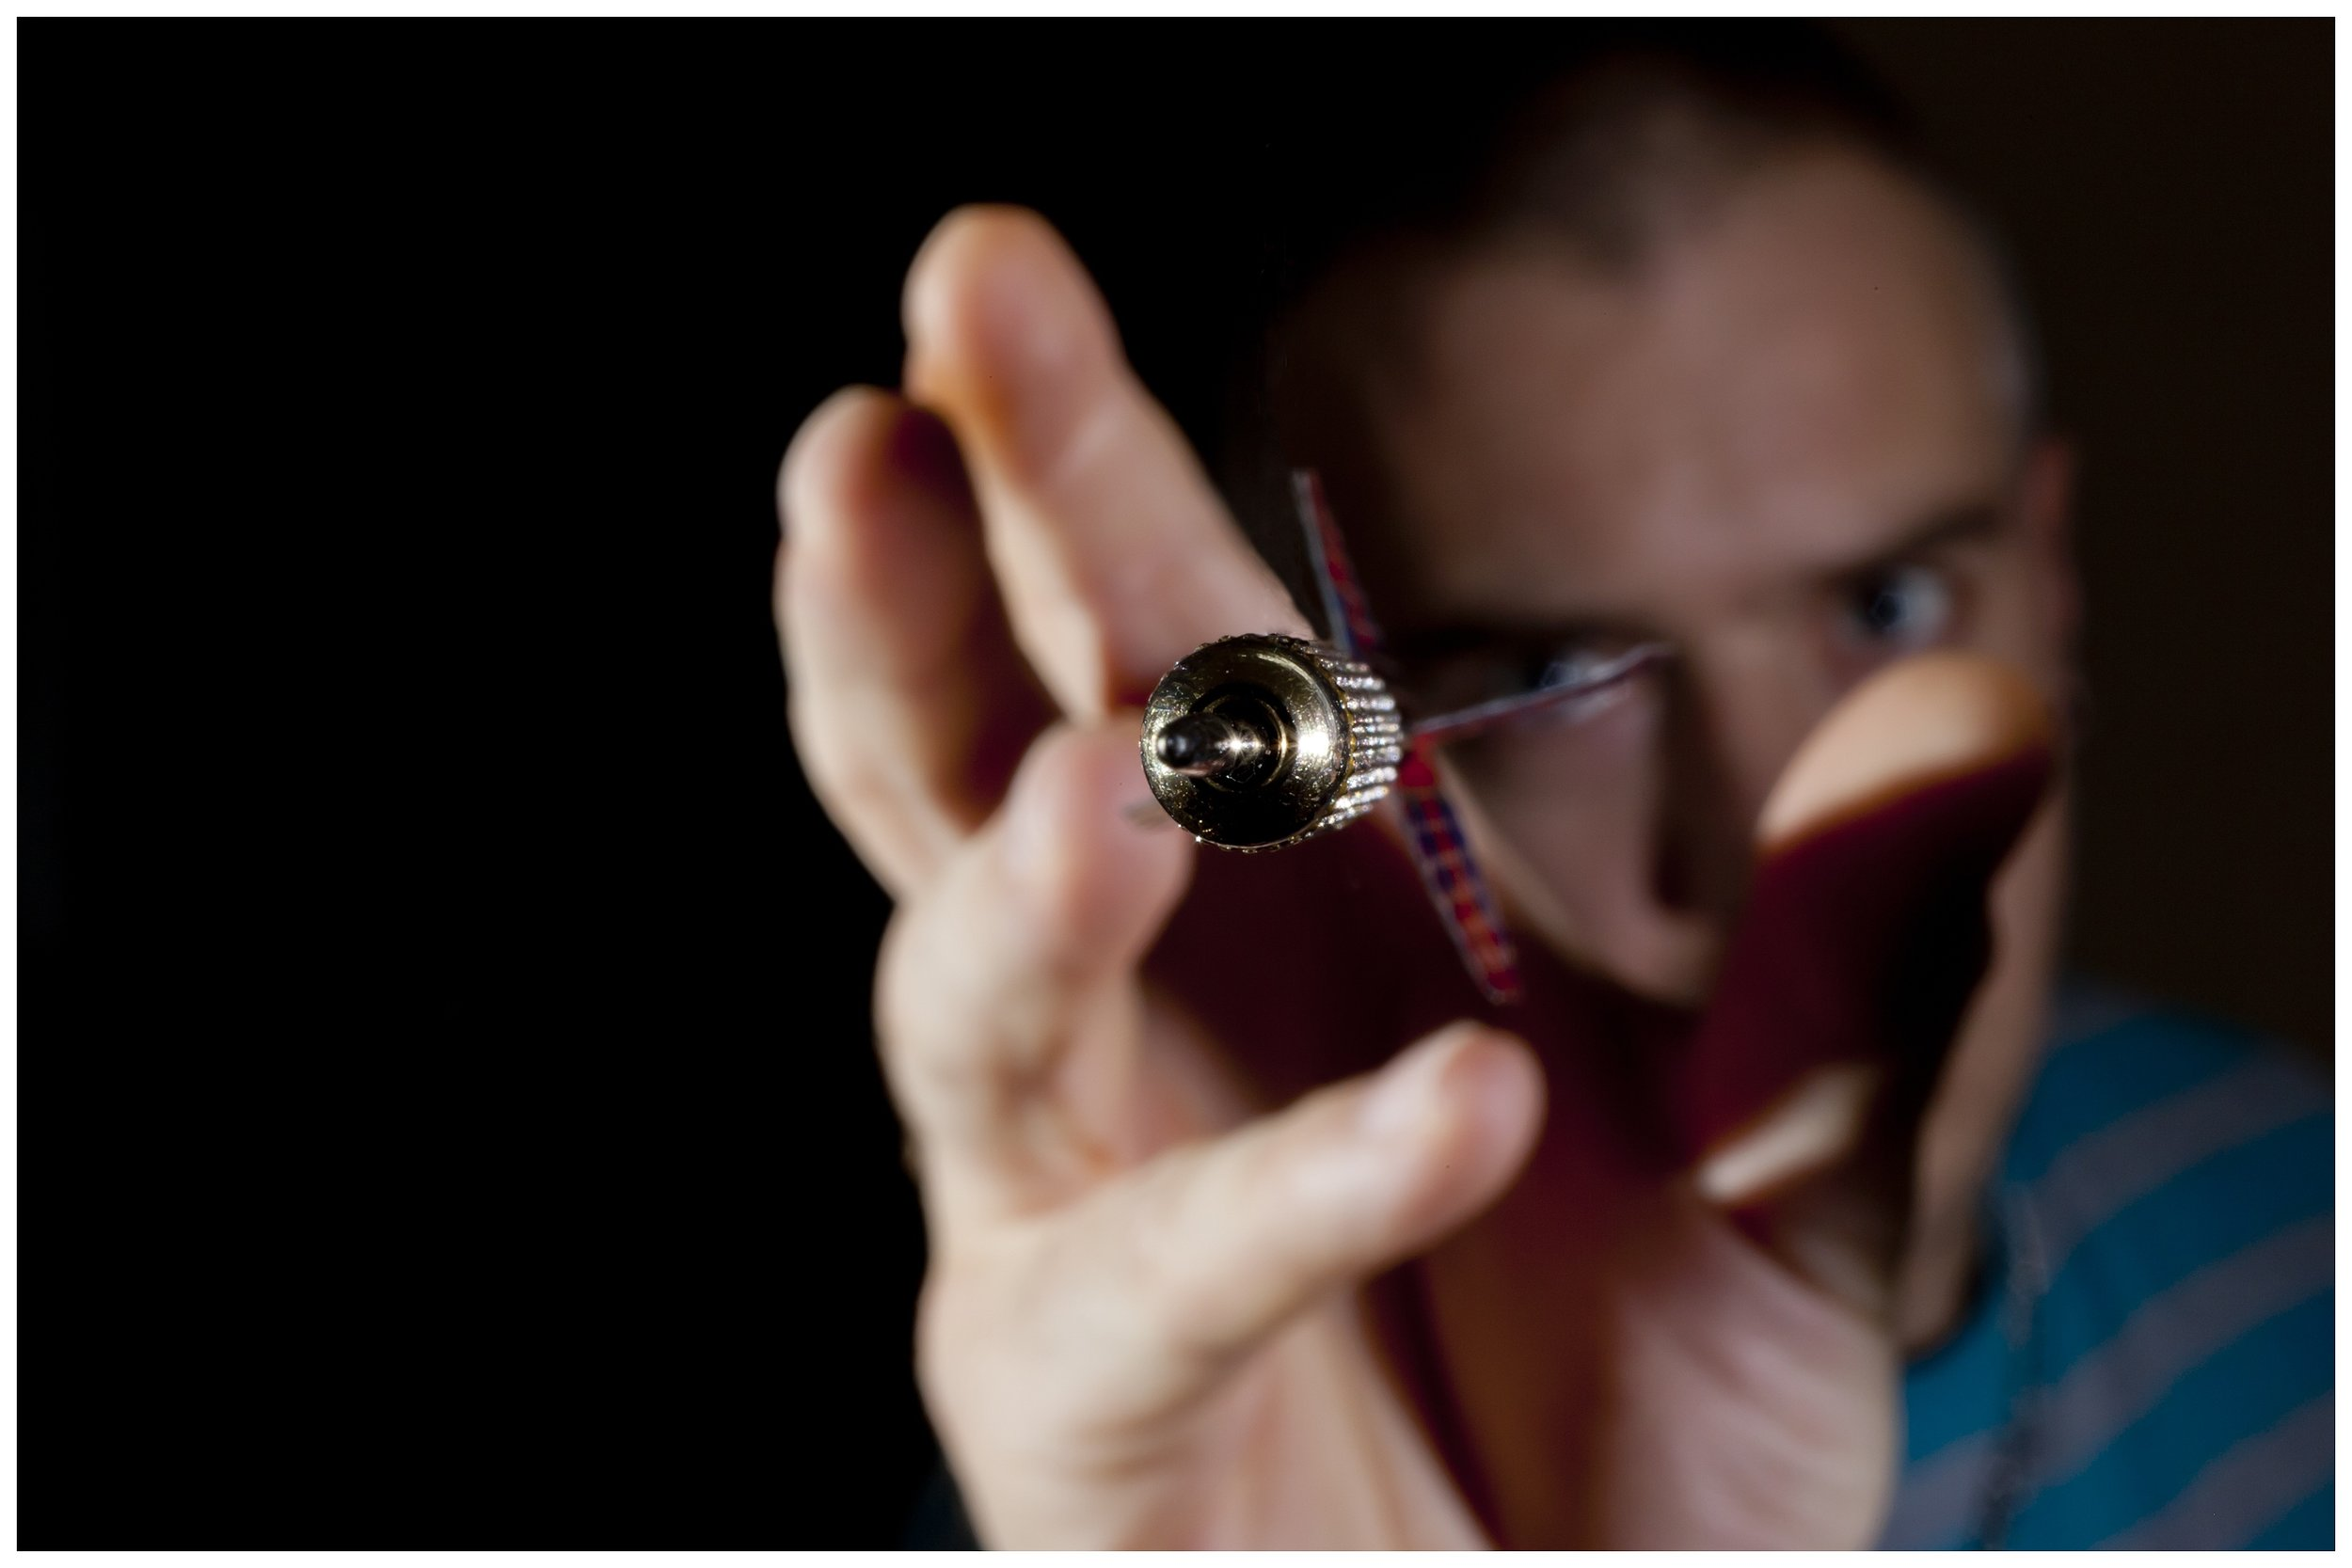 darts-2265723.jpg